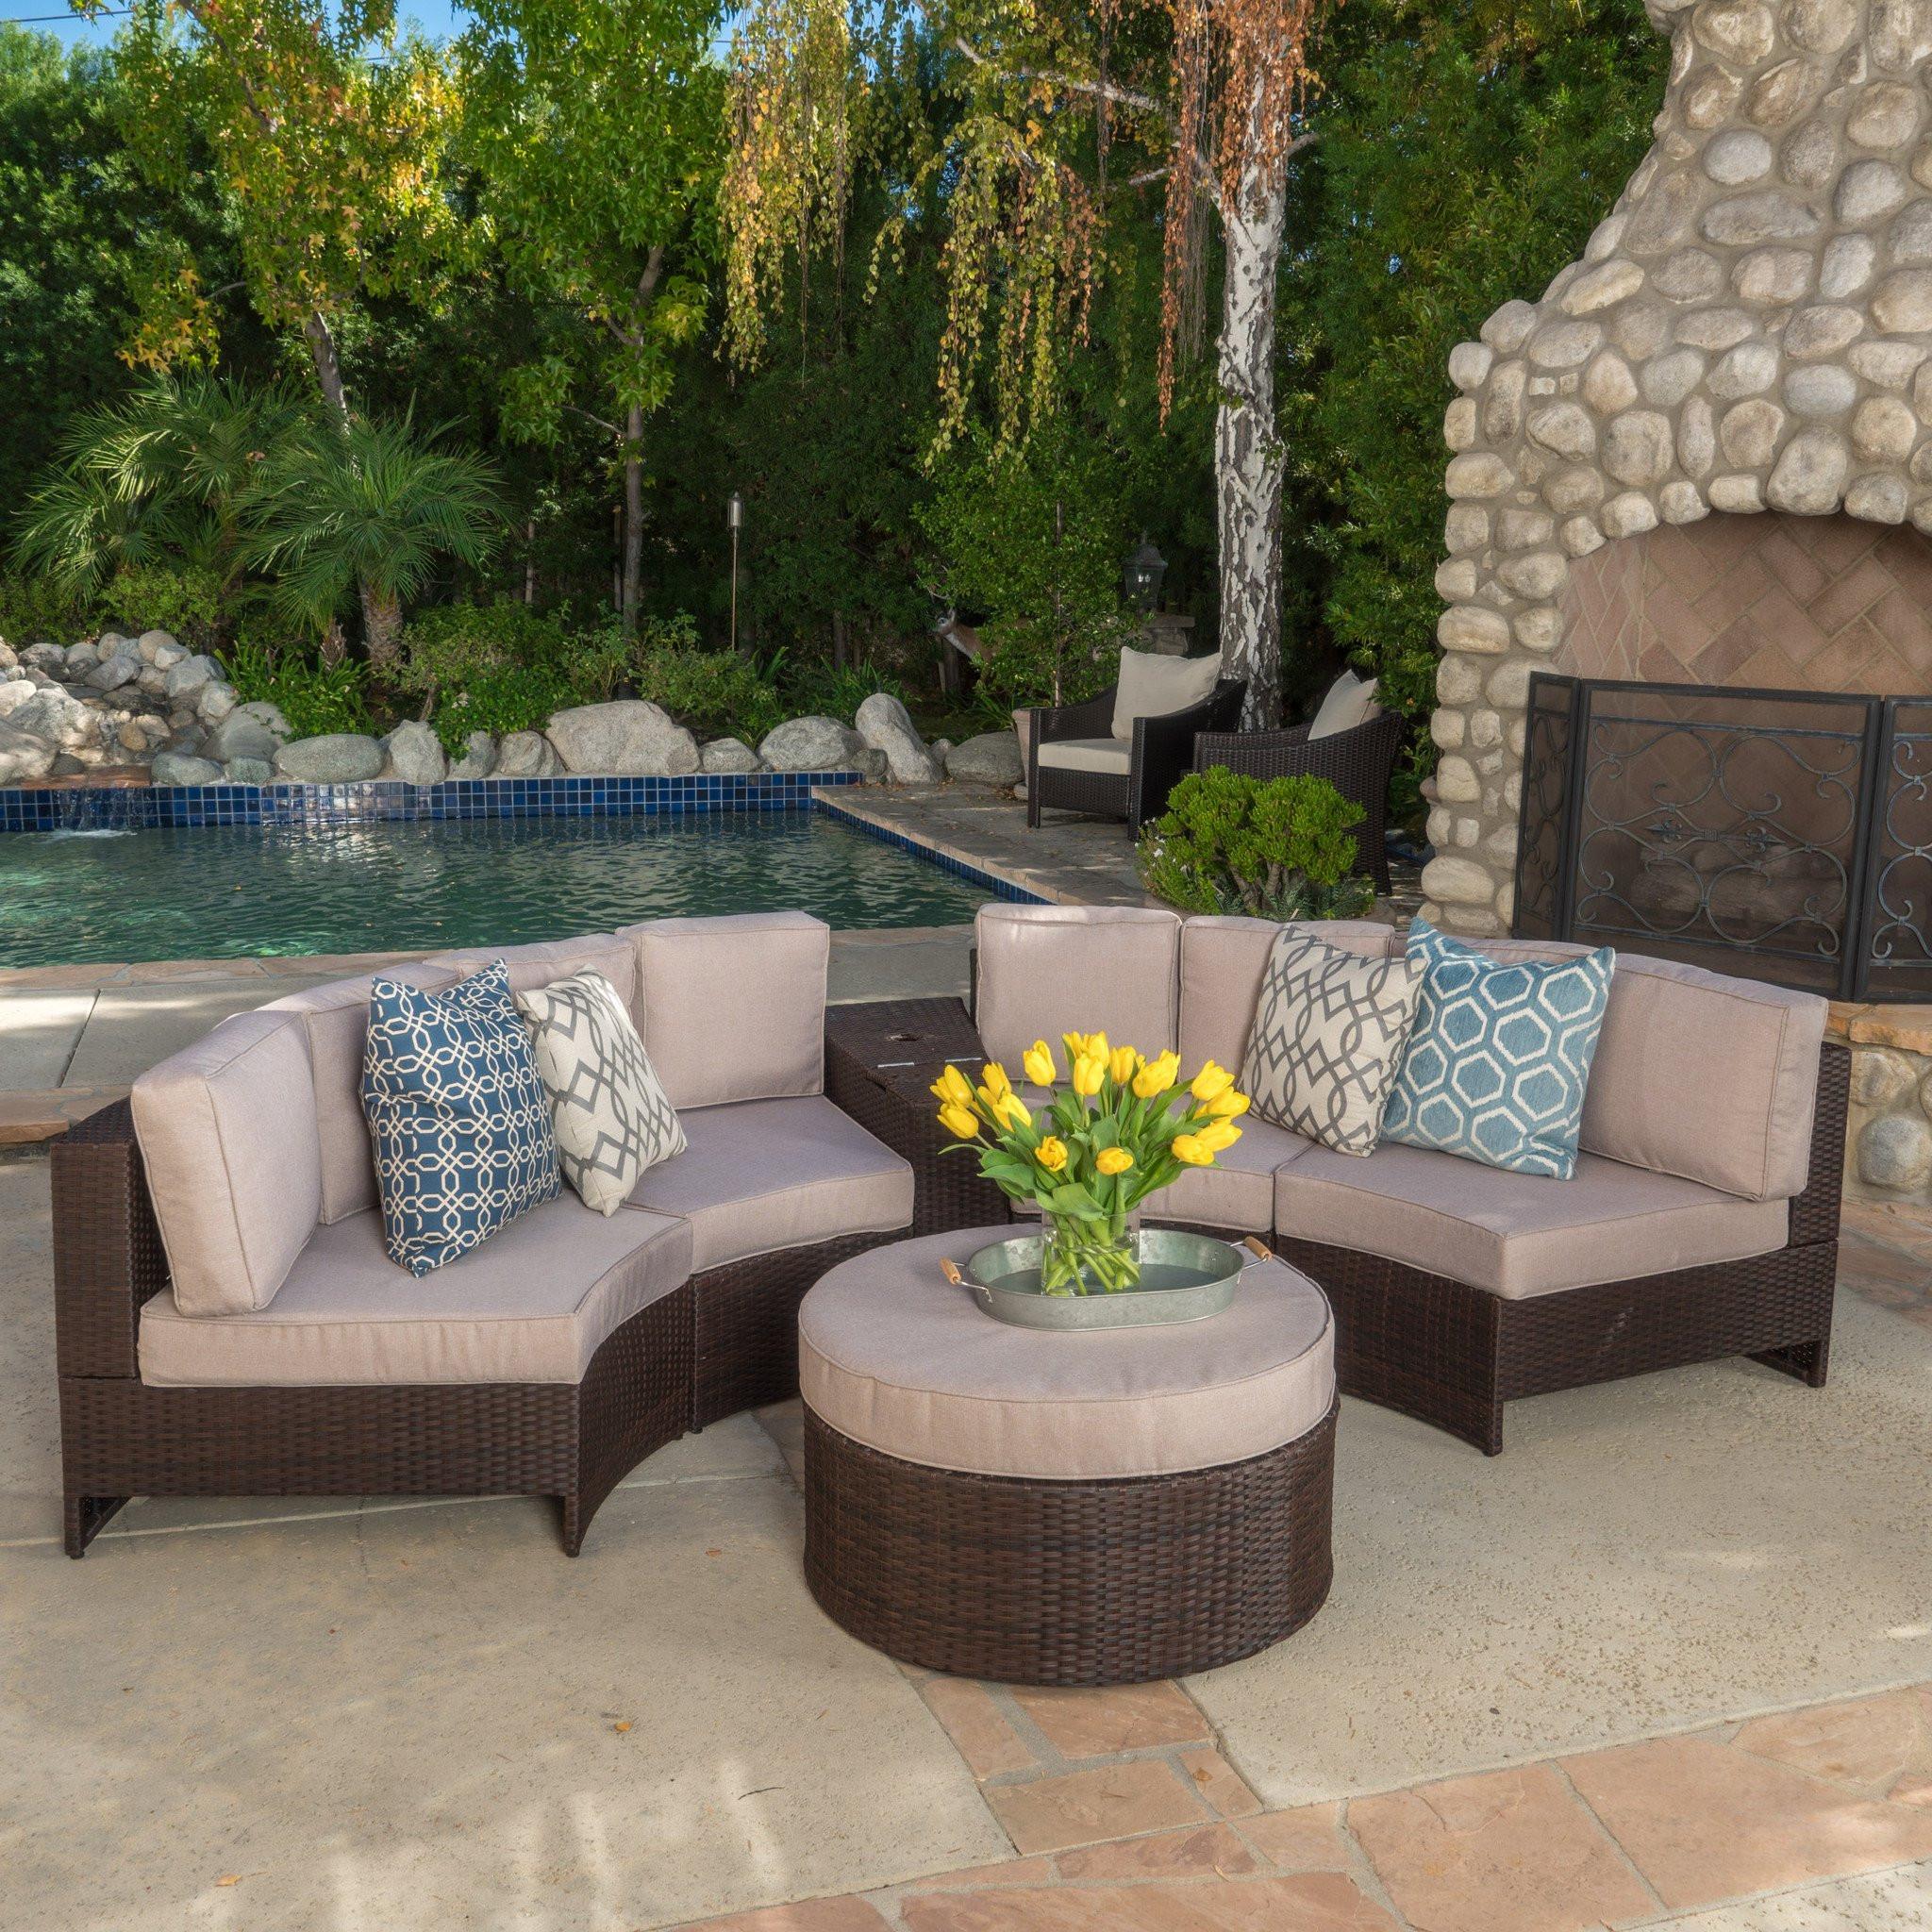 Riviera 6pc Outdoor Sectional Sofa Set w/ Storage...